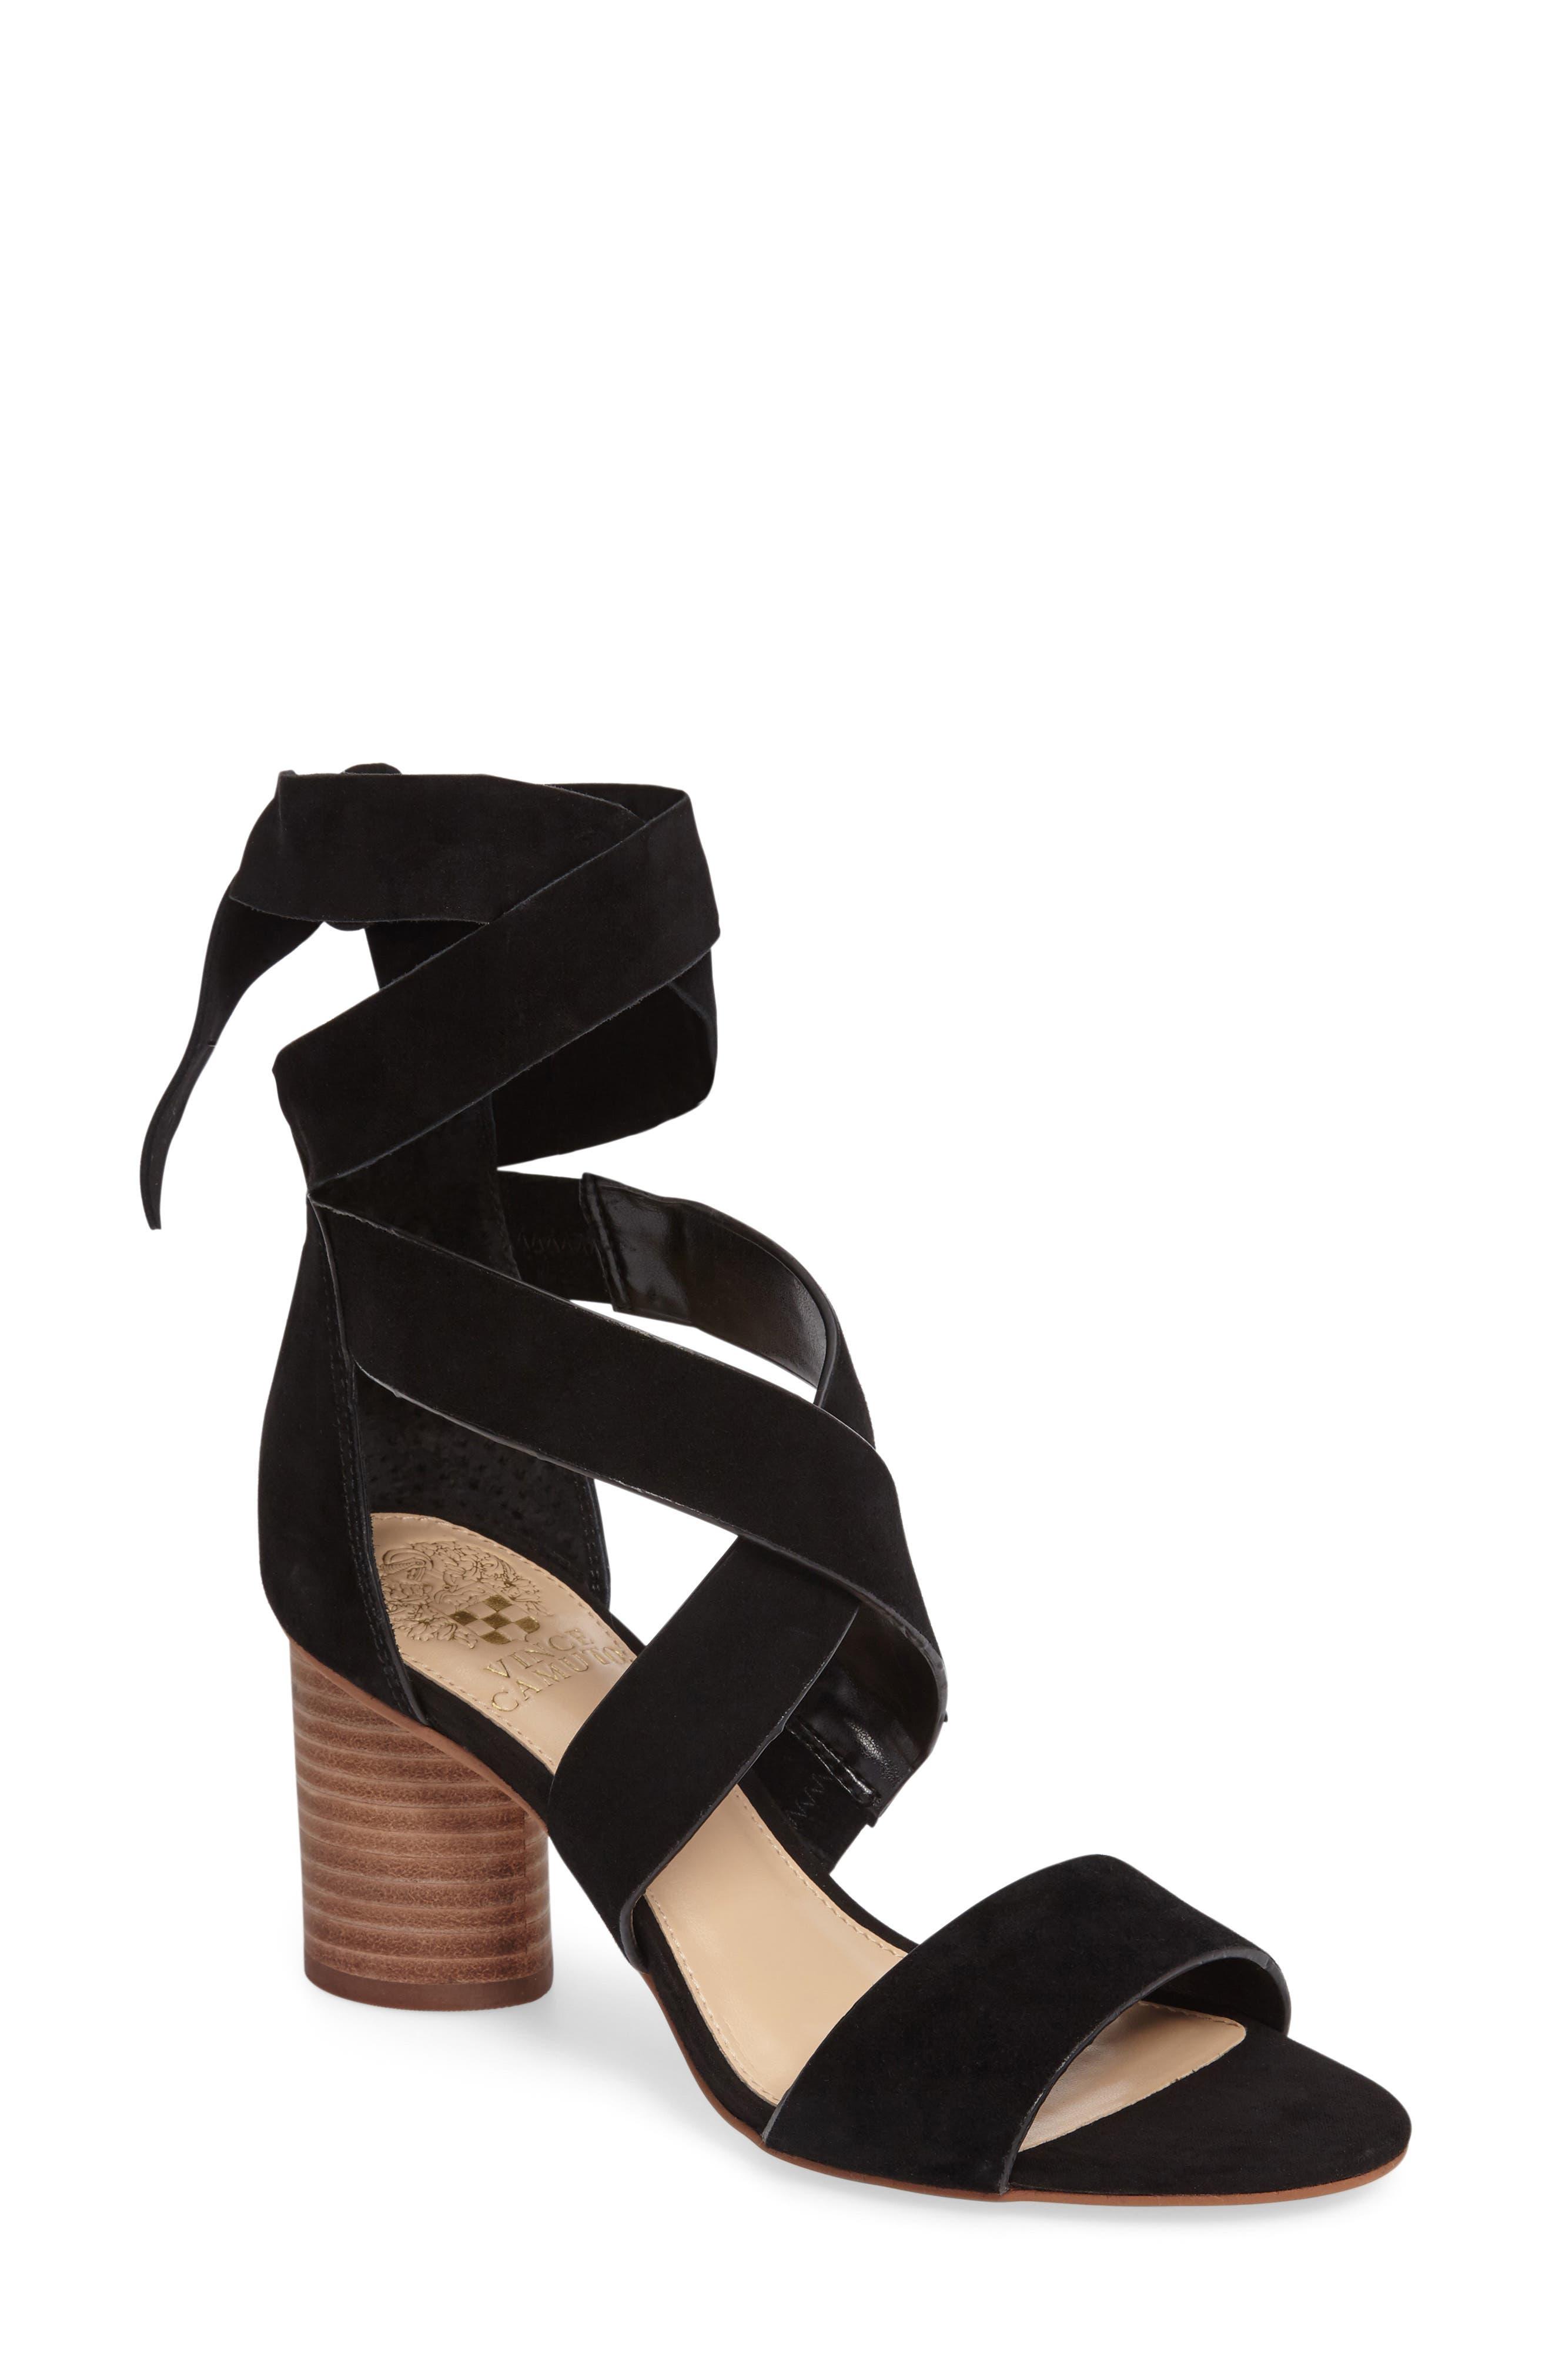 Jeneve Block Heel Sandal,                             Main thumbnail 1, color,                             001